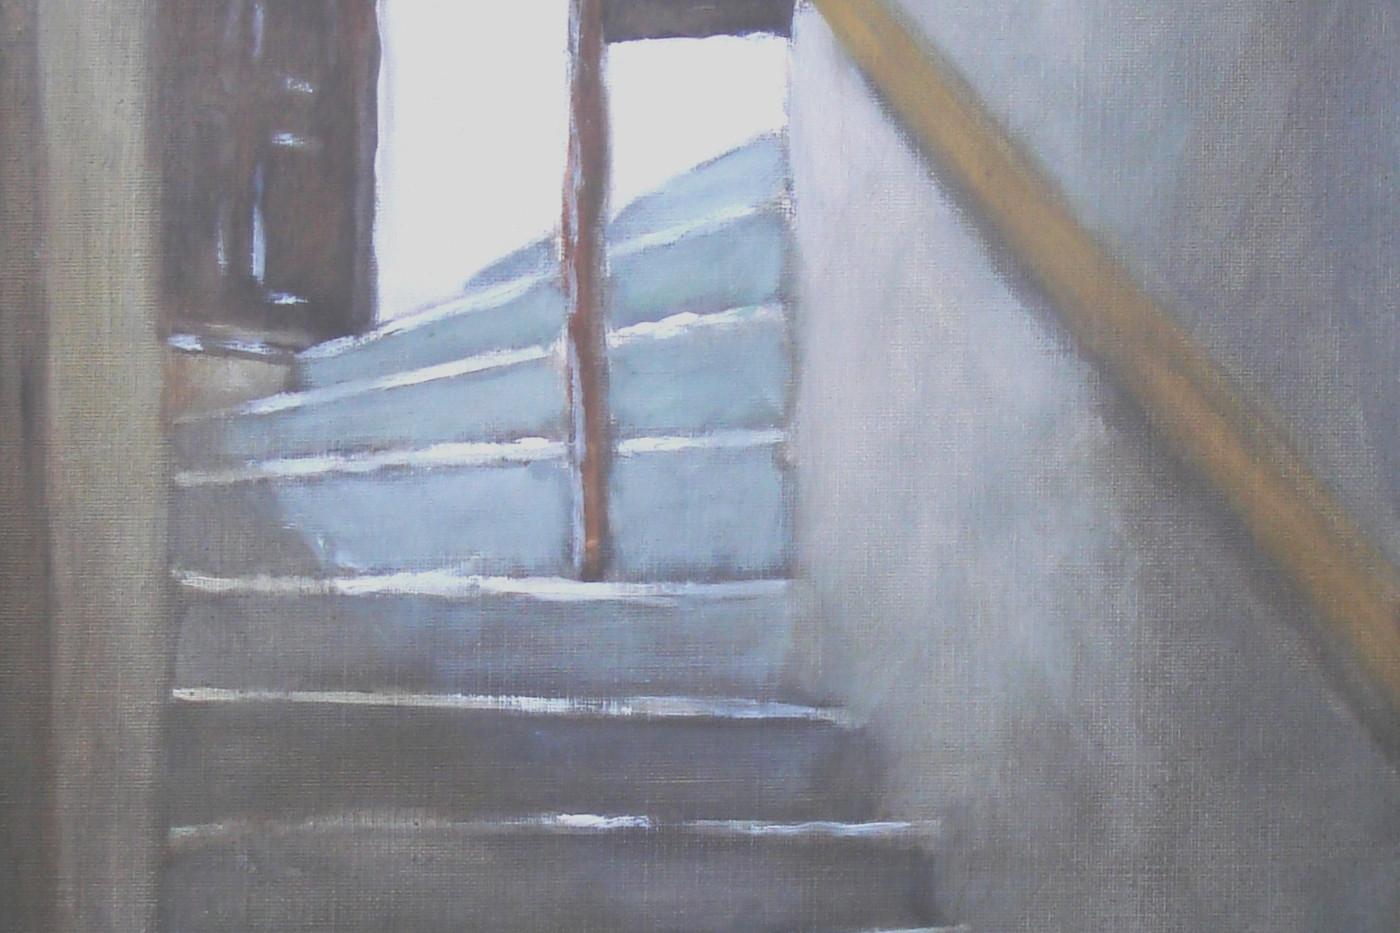 escalierversion2.JPG